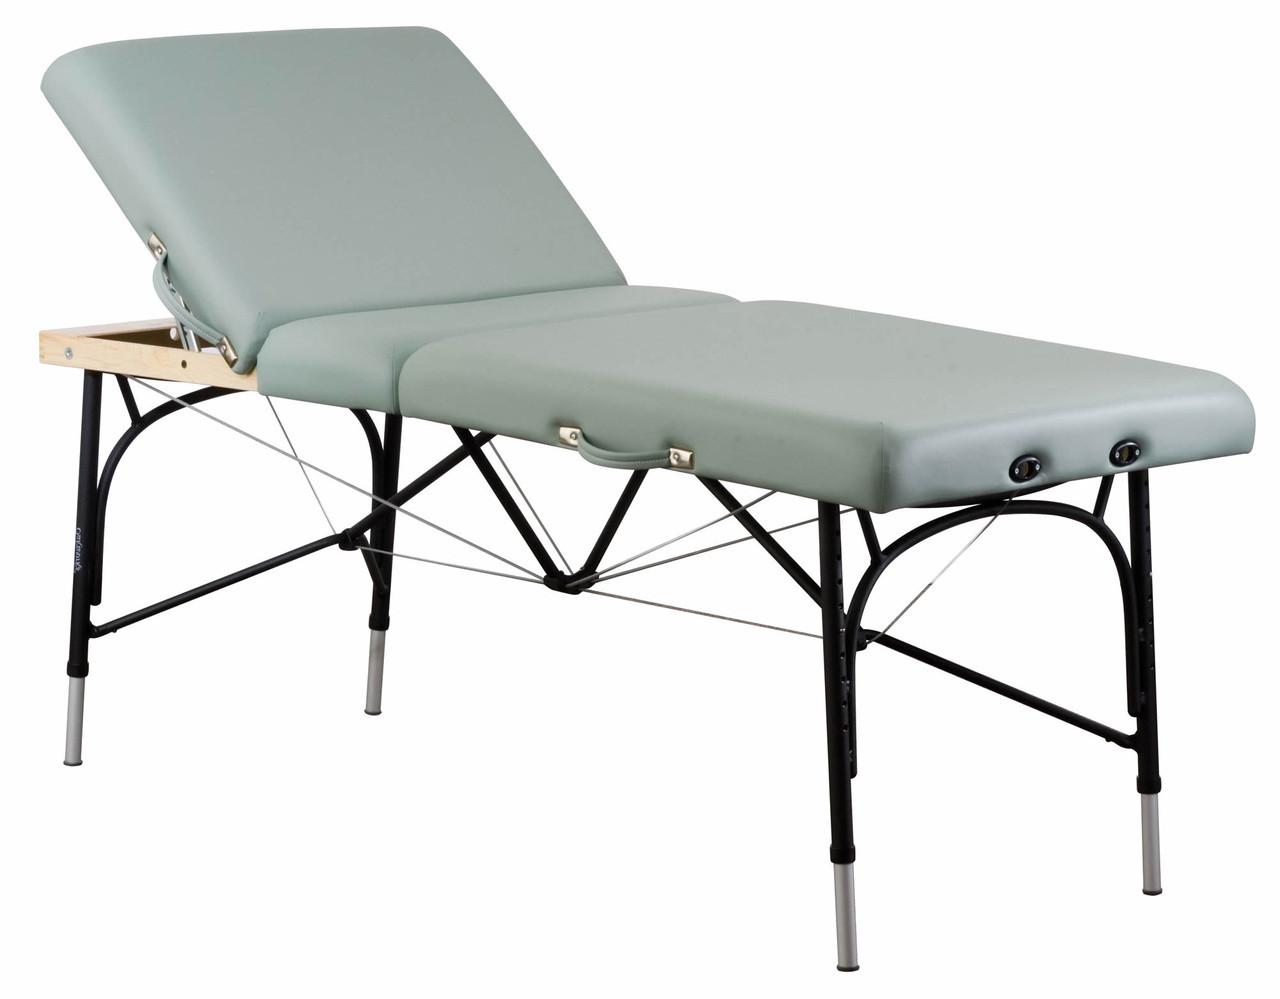 Oakworks Alliance Aluminum Massage Table  Massage World. Tilt Out Drawer. Desk Stuff. Stein World Chest Of Drawers. Gliderite Drawer Slides. Airplane Desk Models. College Desk Chair. Laminate Desk Top. Pink Coffee Table